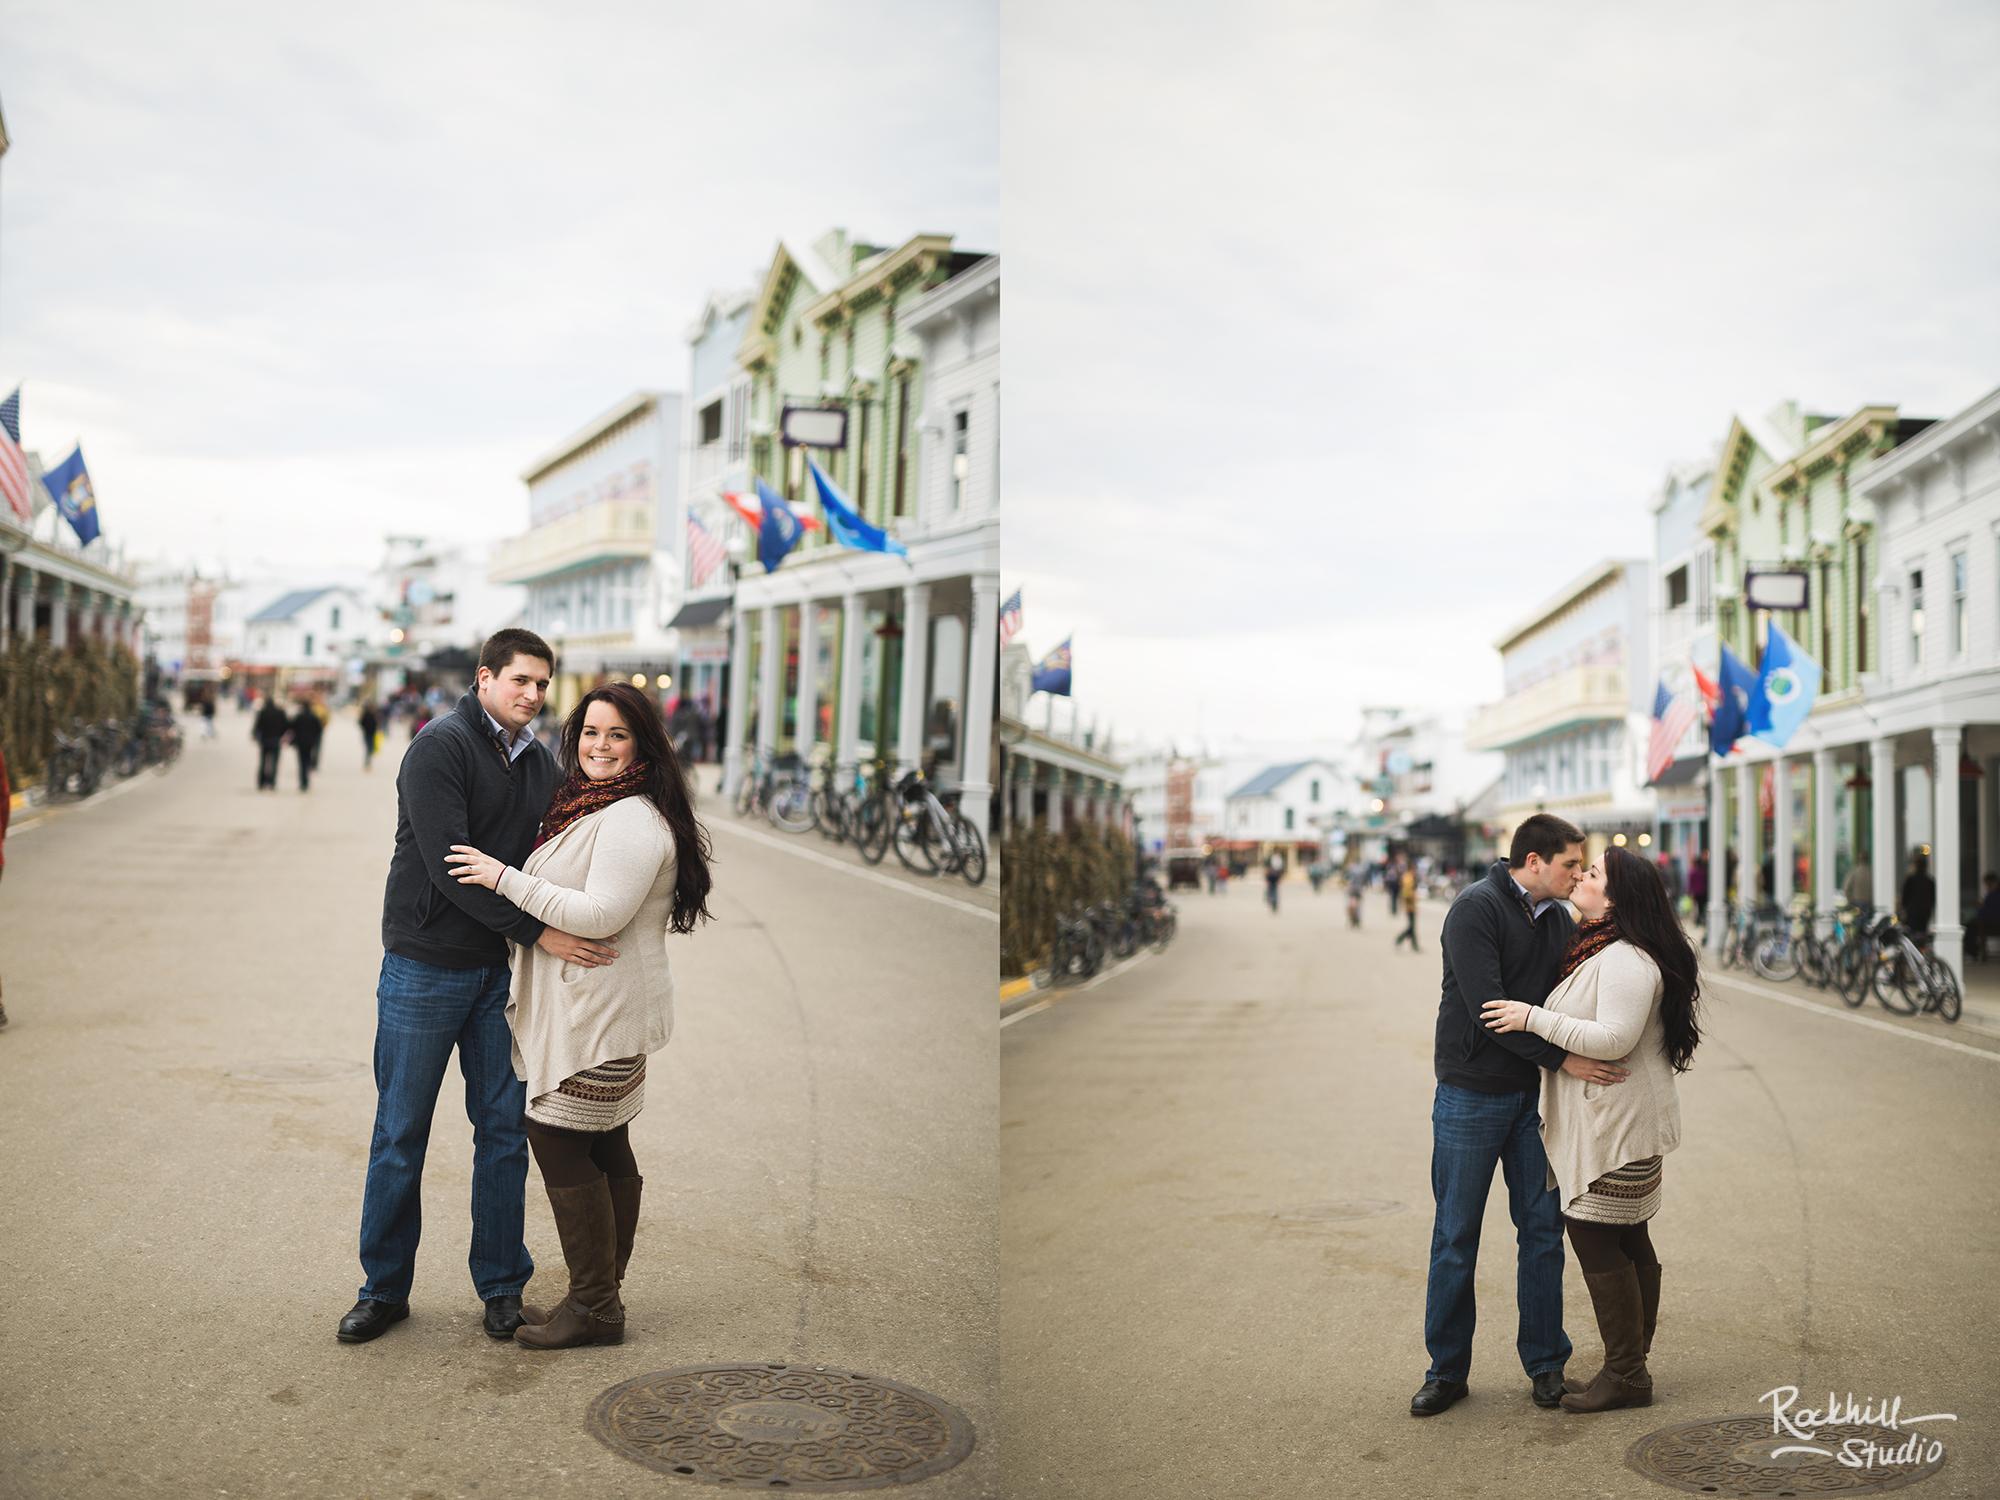 mackinac-island-wedding-engagement-michigan-rockhill-14.jpg